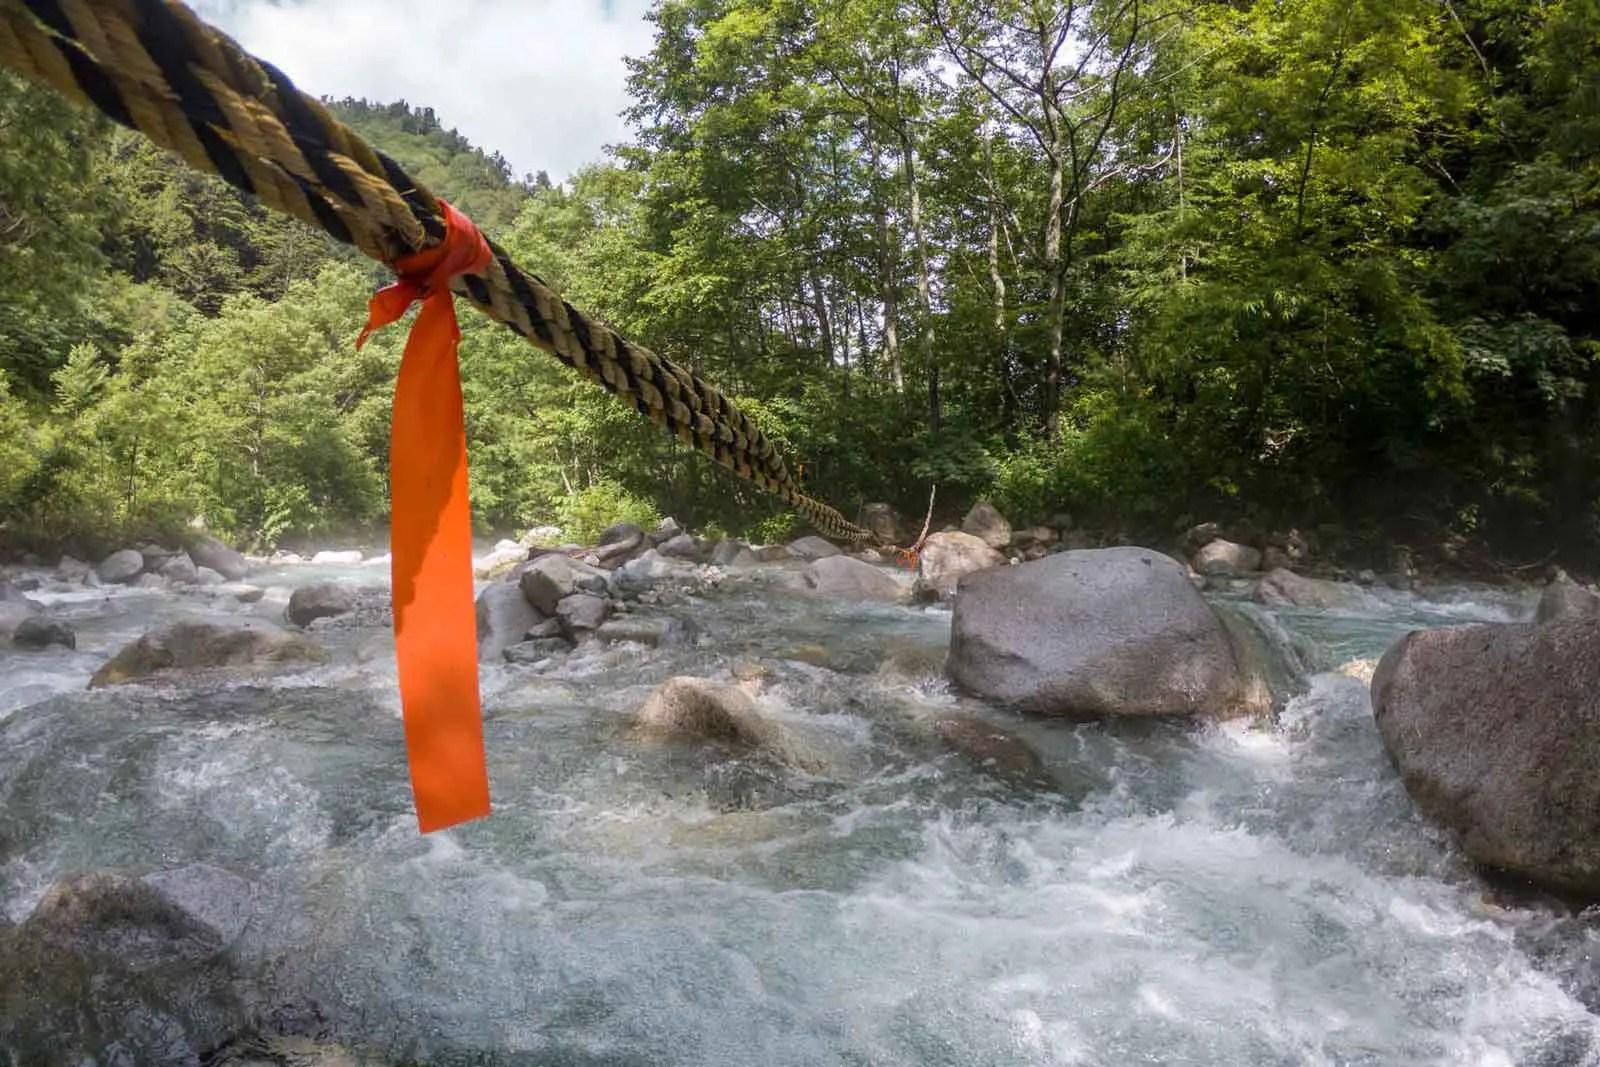 Japan Alps Traverse Kita Alps Rope River Crossing